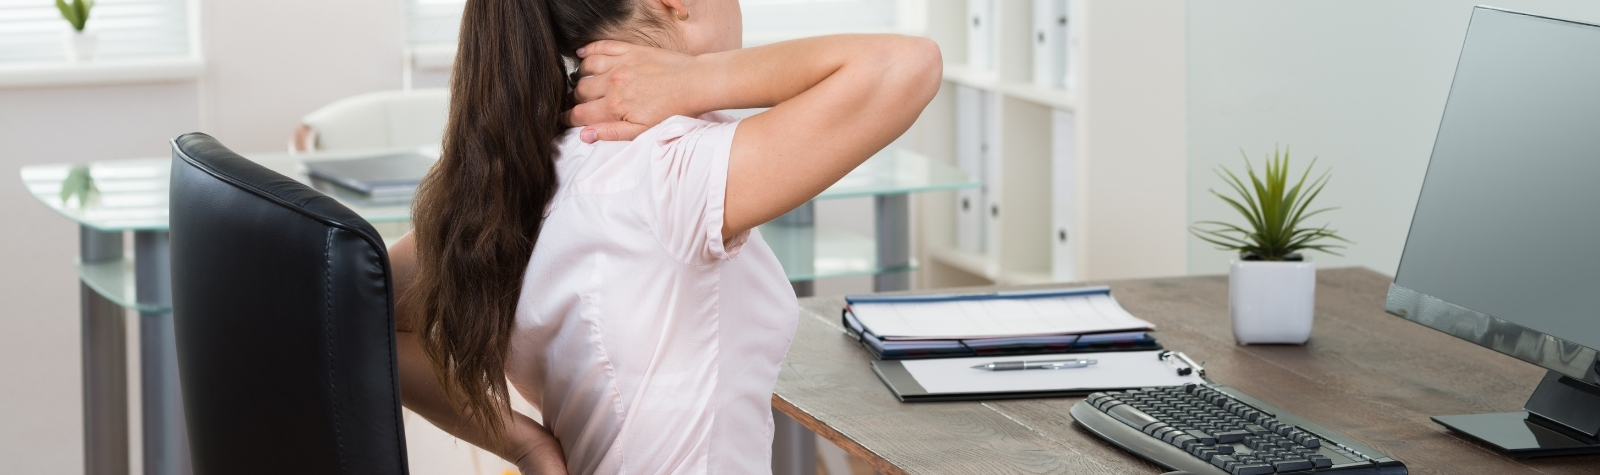 Correcting Poor Posture